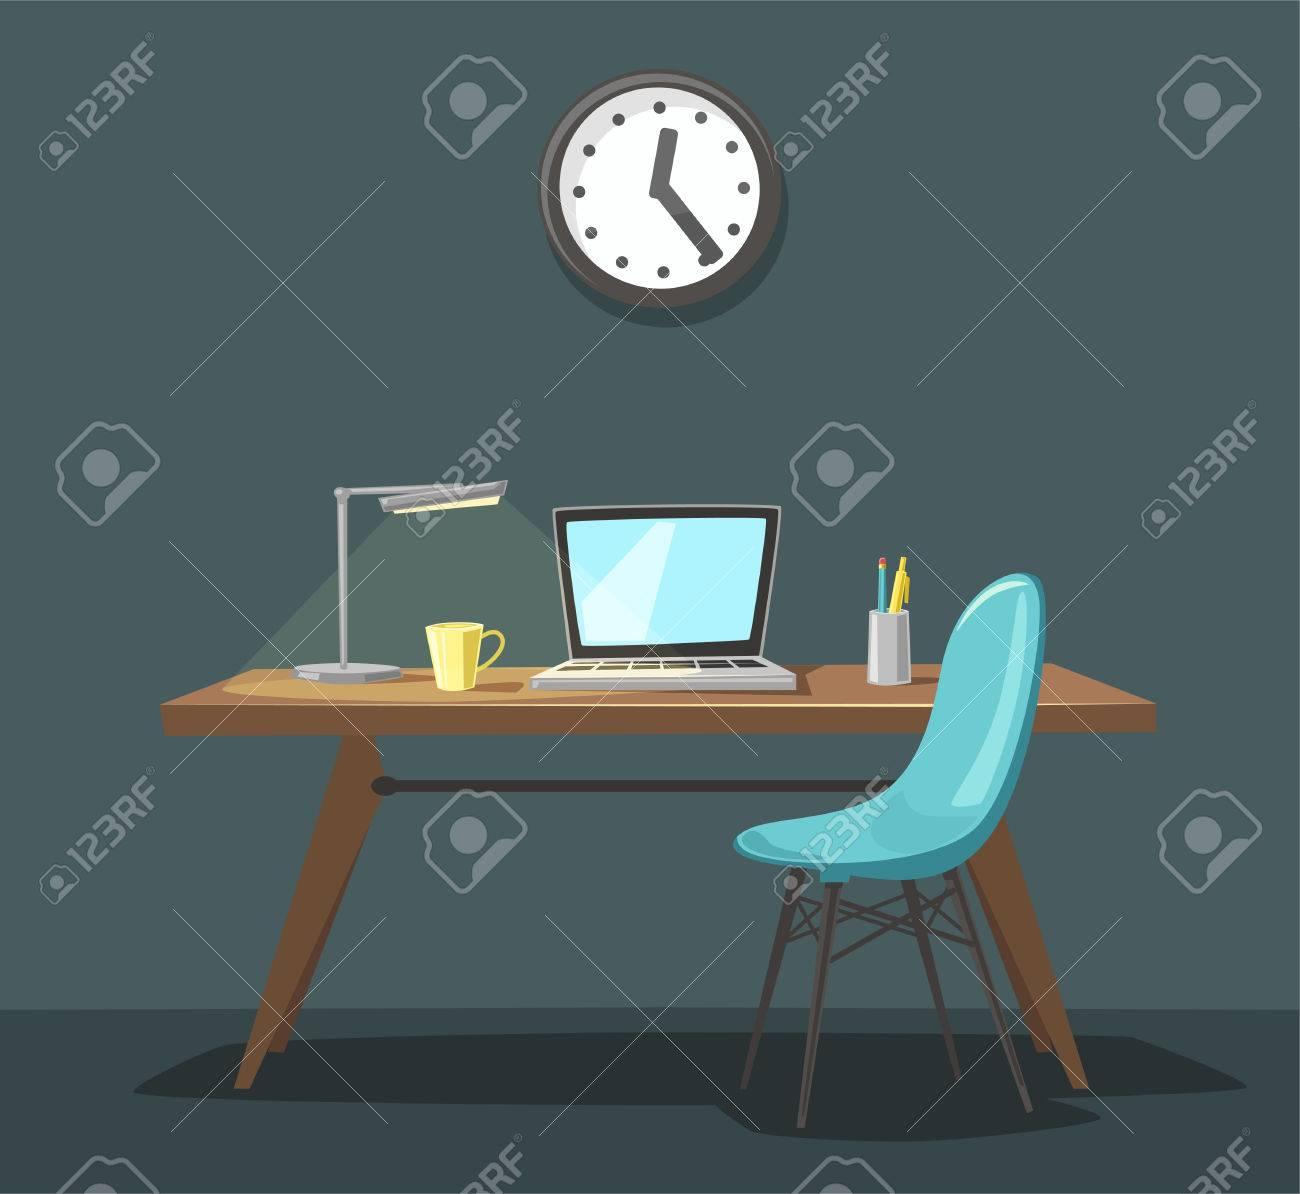 Modern Workplace Office Work Cartoon Vector Illustration Royalty